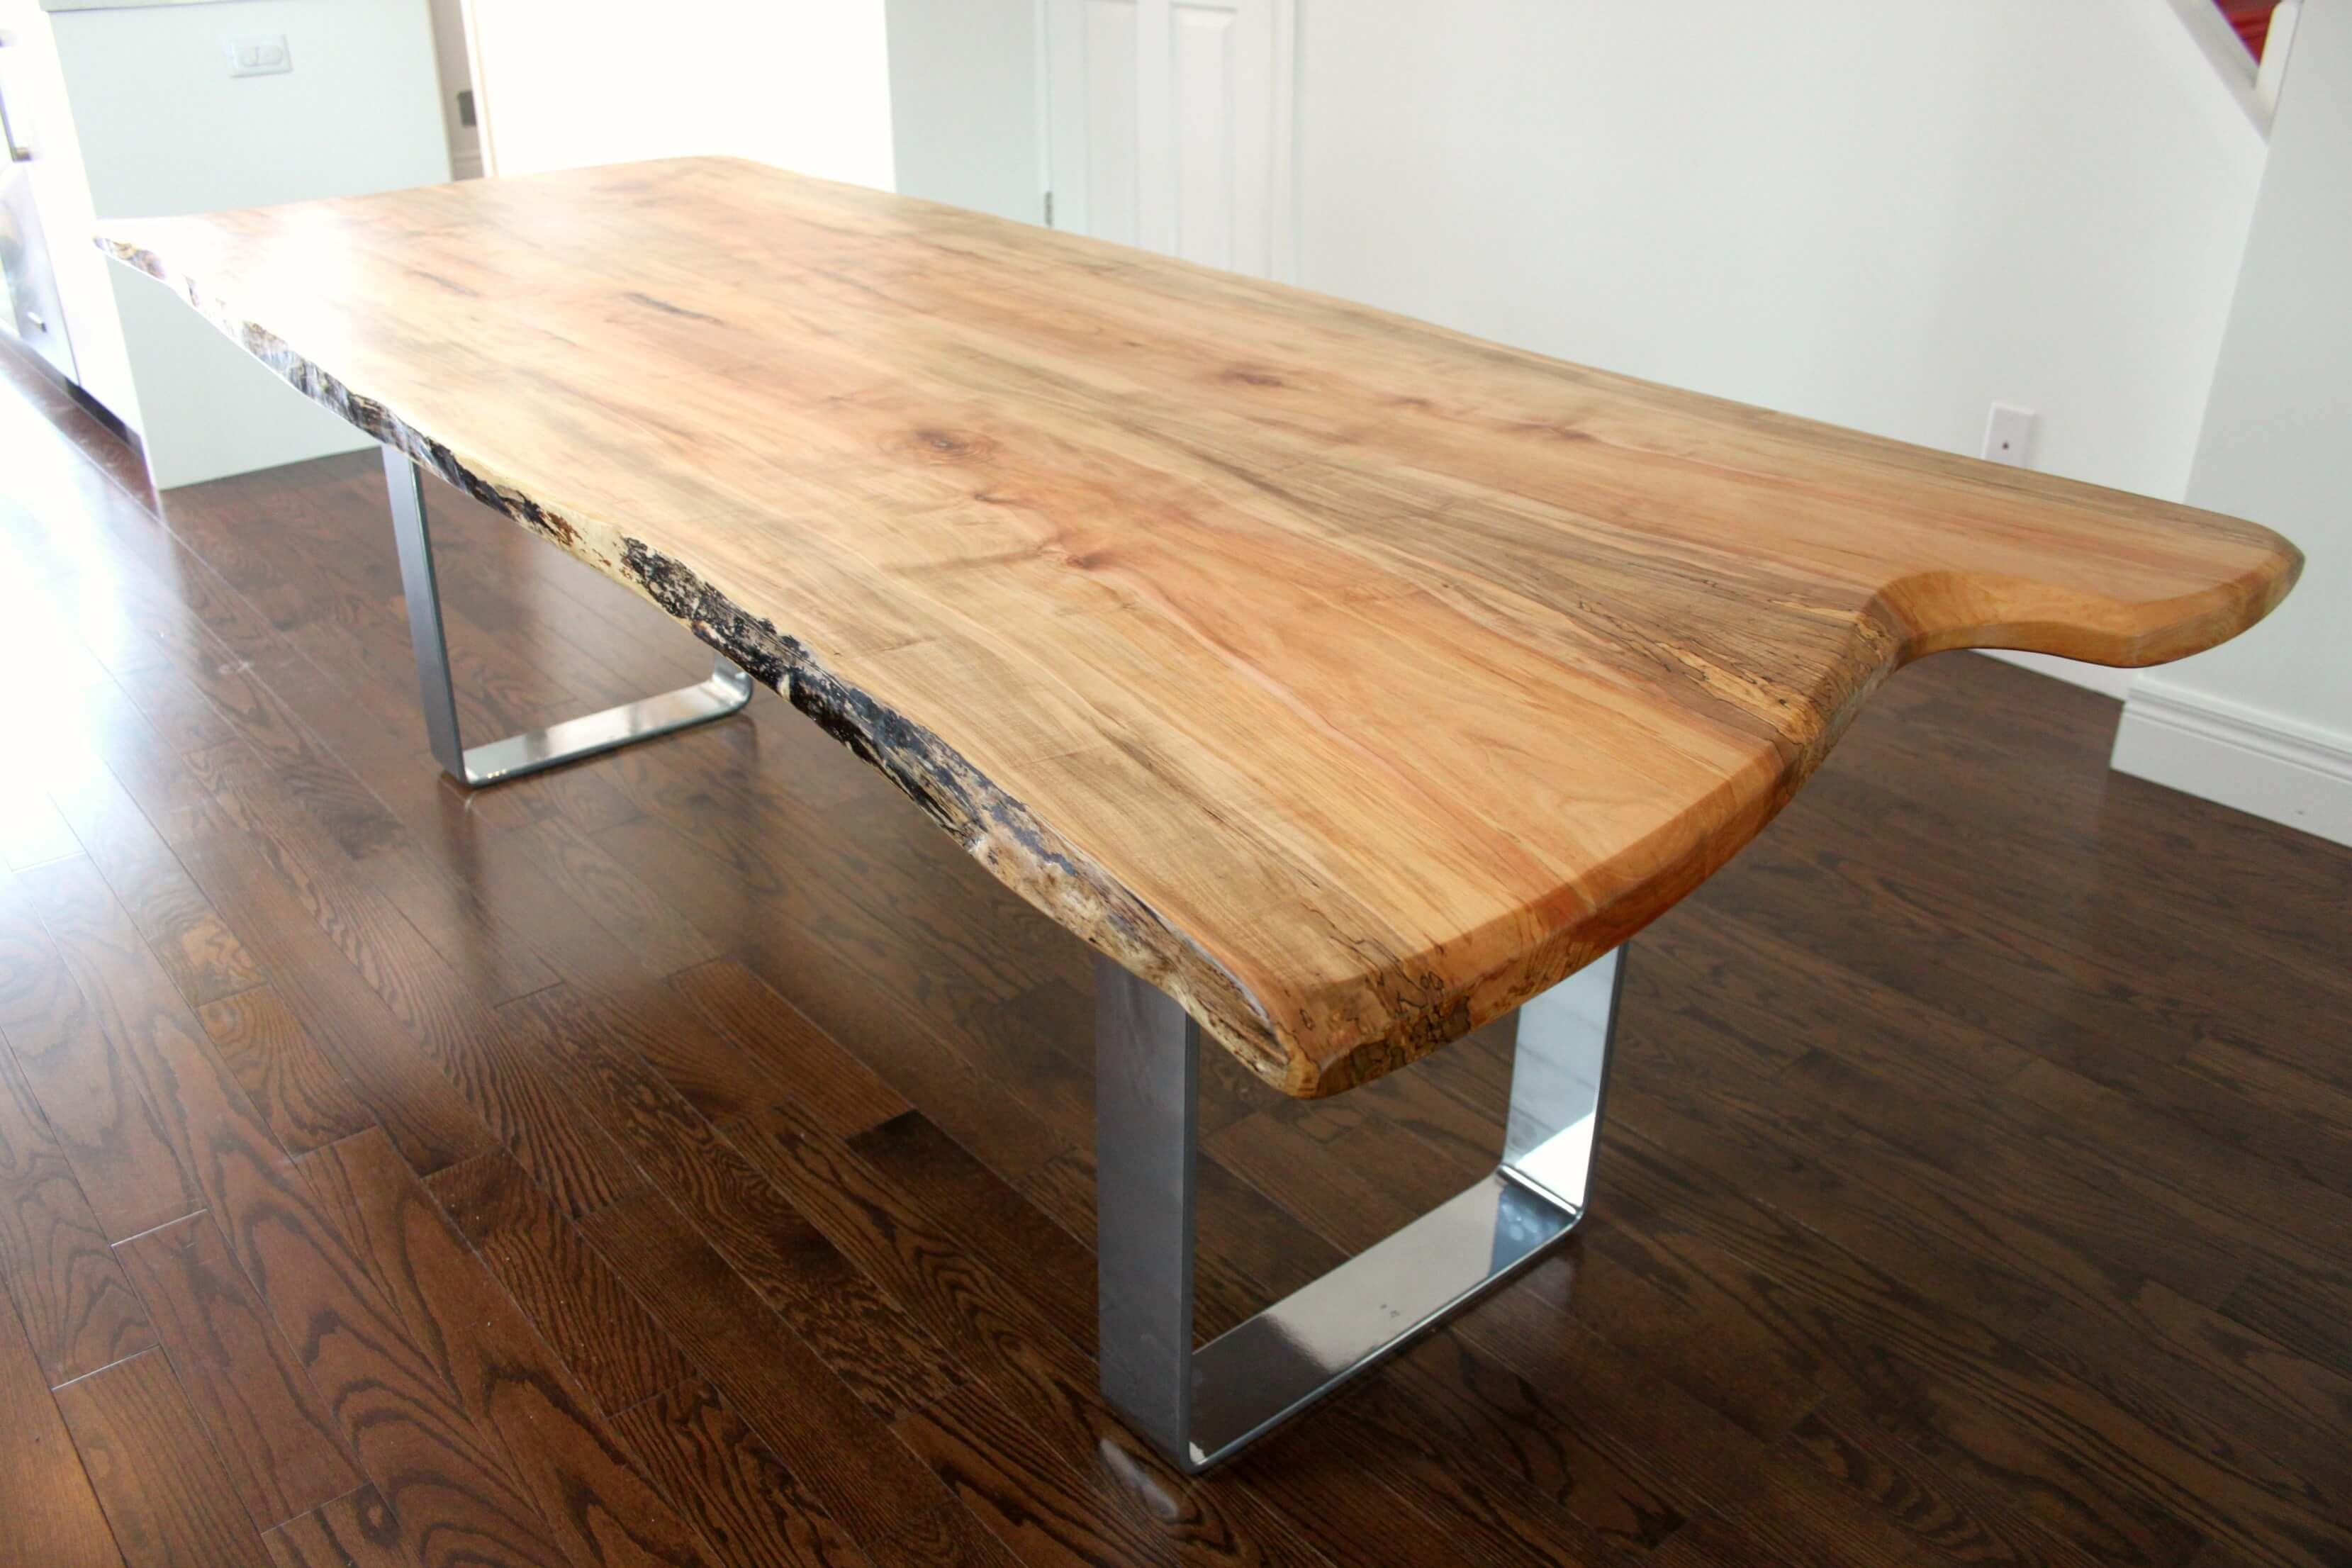 Modern Live Edge Maple Table With Sleek Chrome Base